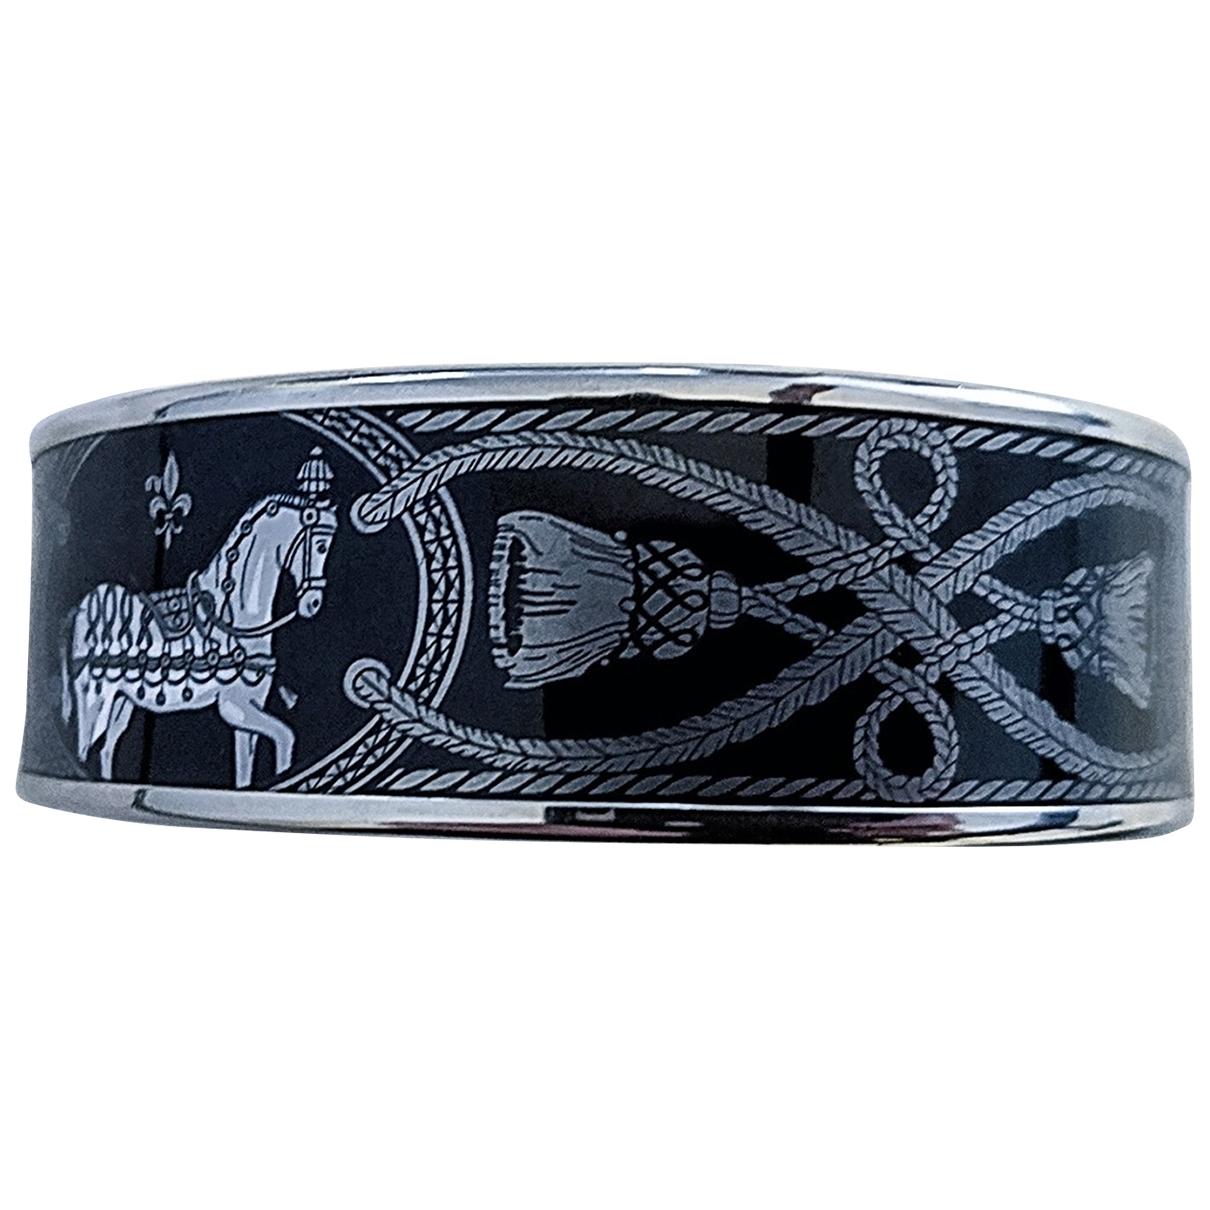 Hermes - Bracelet Bracelet Email pour femme en plaque or - noir